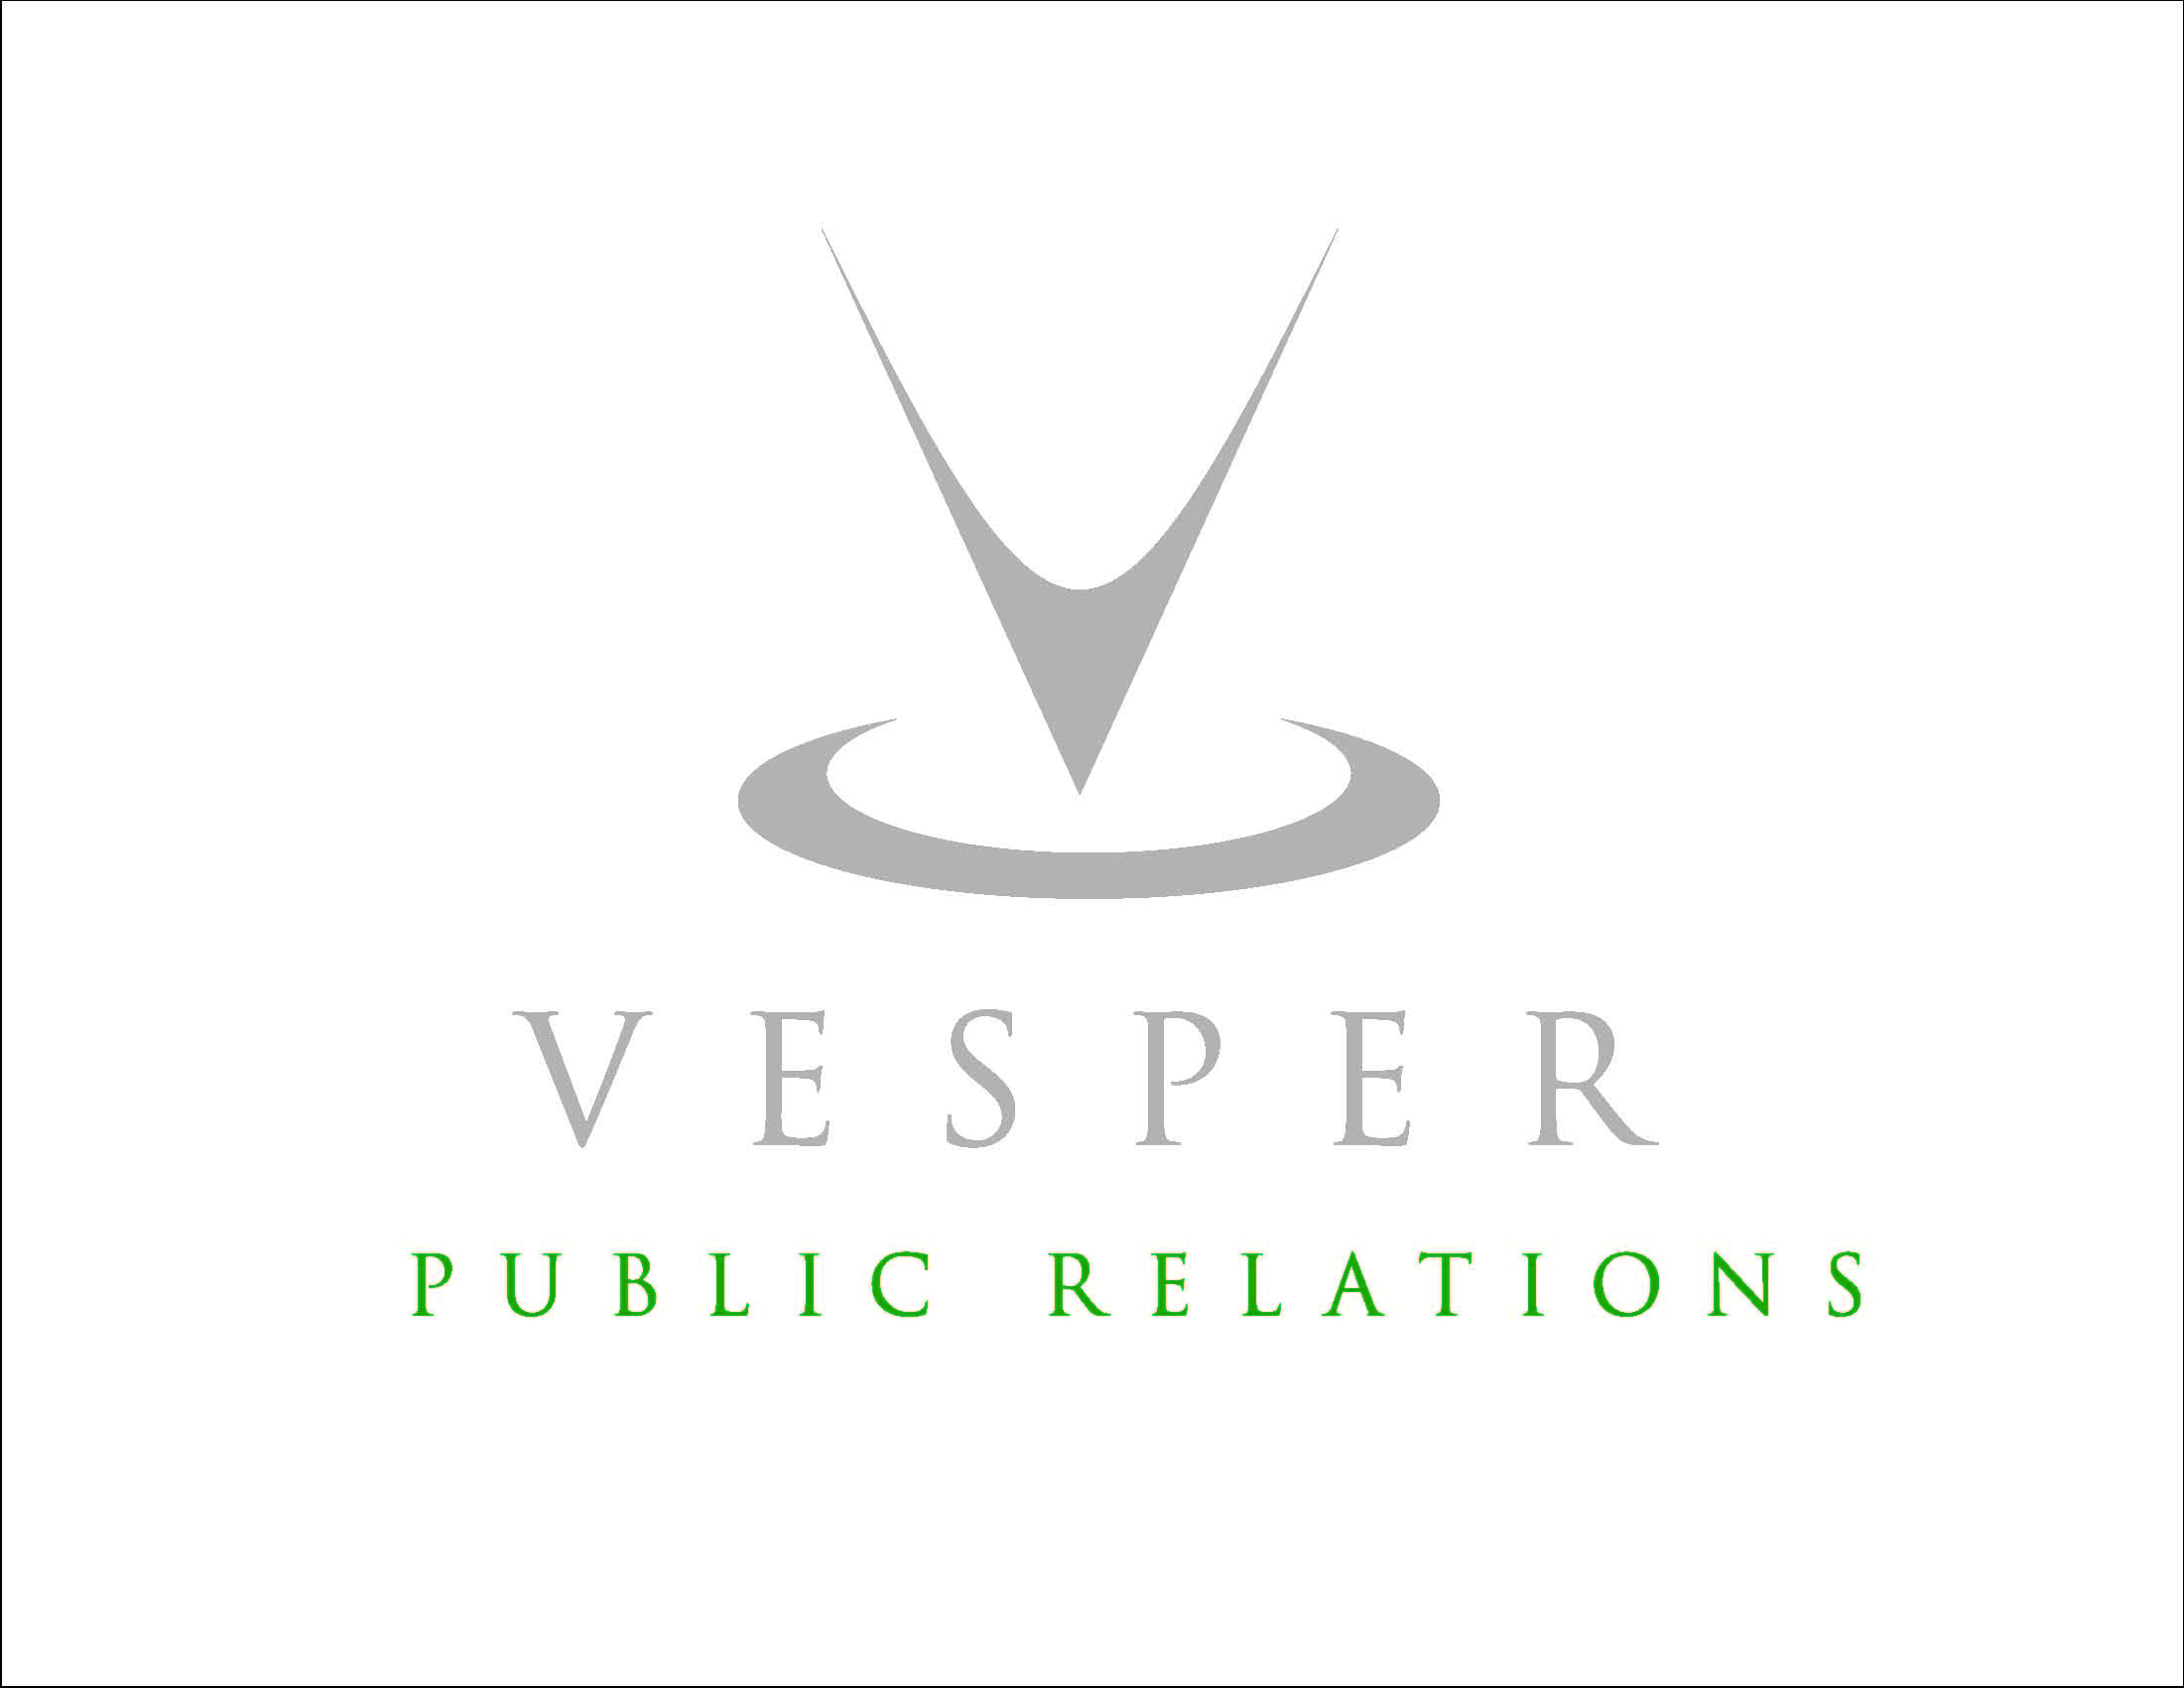 Vesper Public Relations - Logo